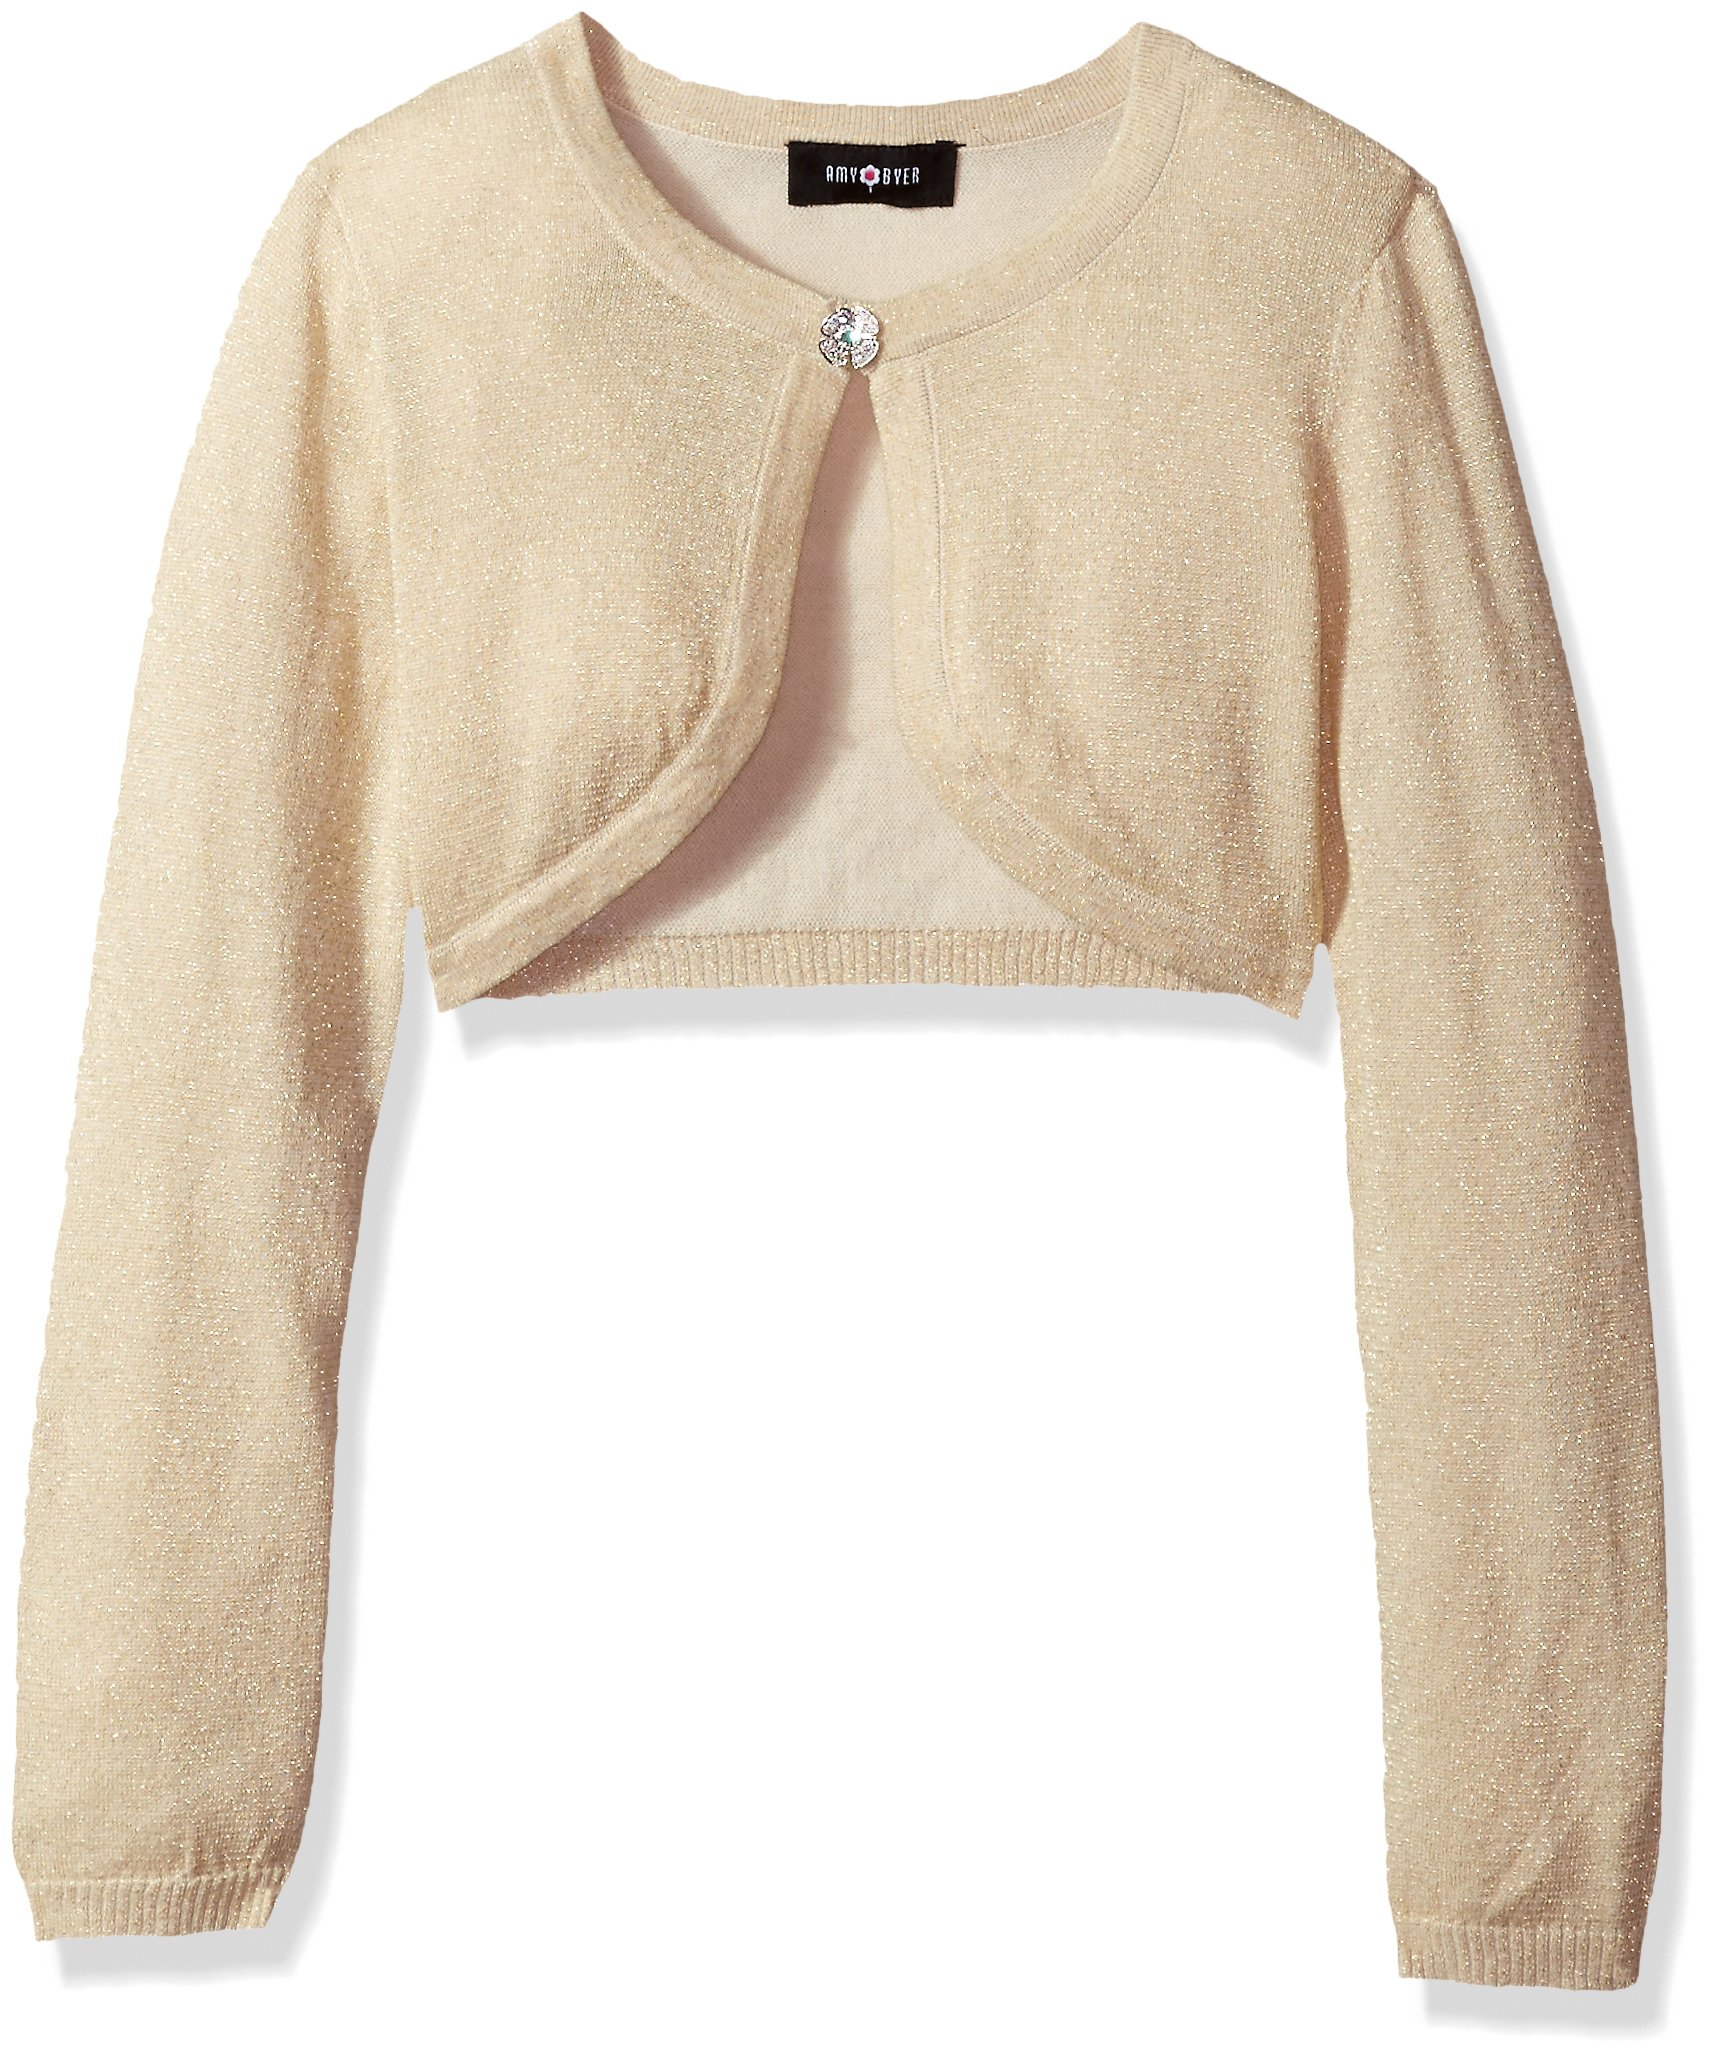 Amy Byer Big Girls' Long Sleeve Metallic Cardigan, Gold, S